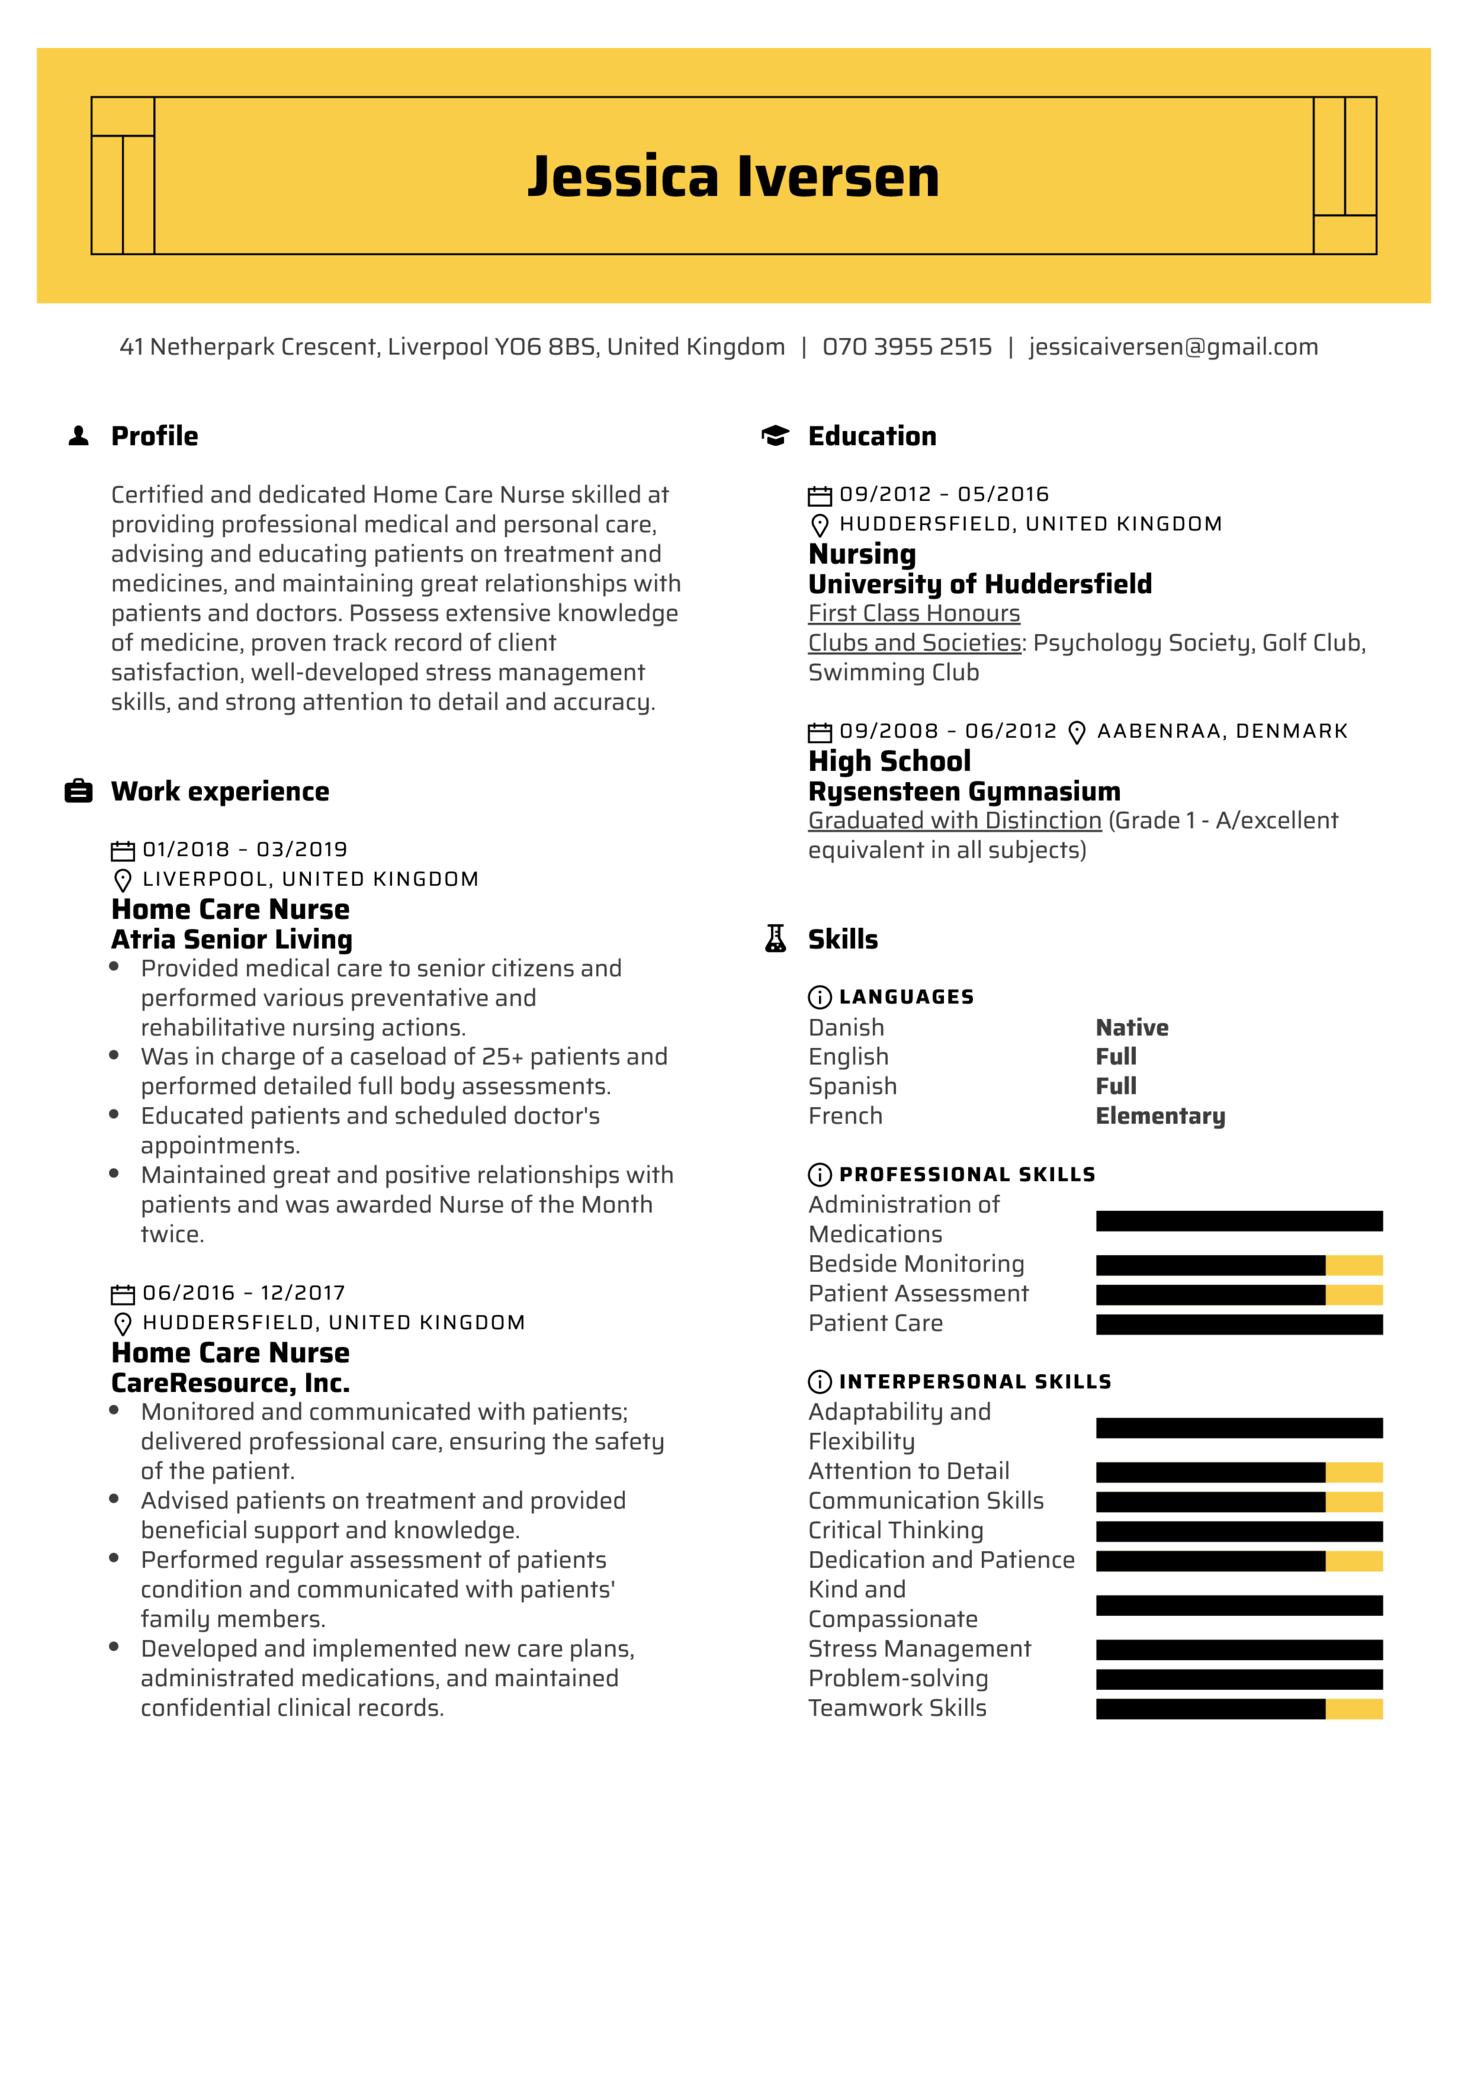 Home Care Nurse Resume Example (Part 1)